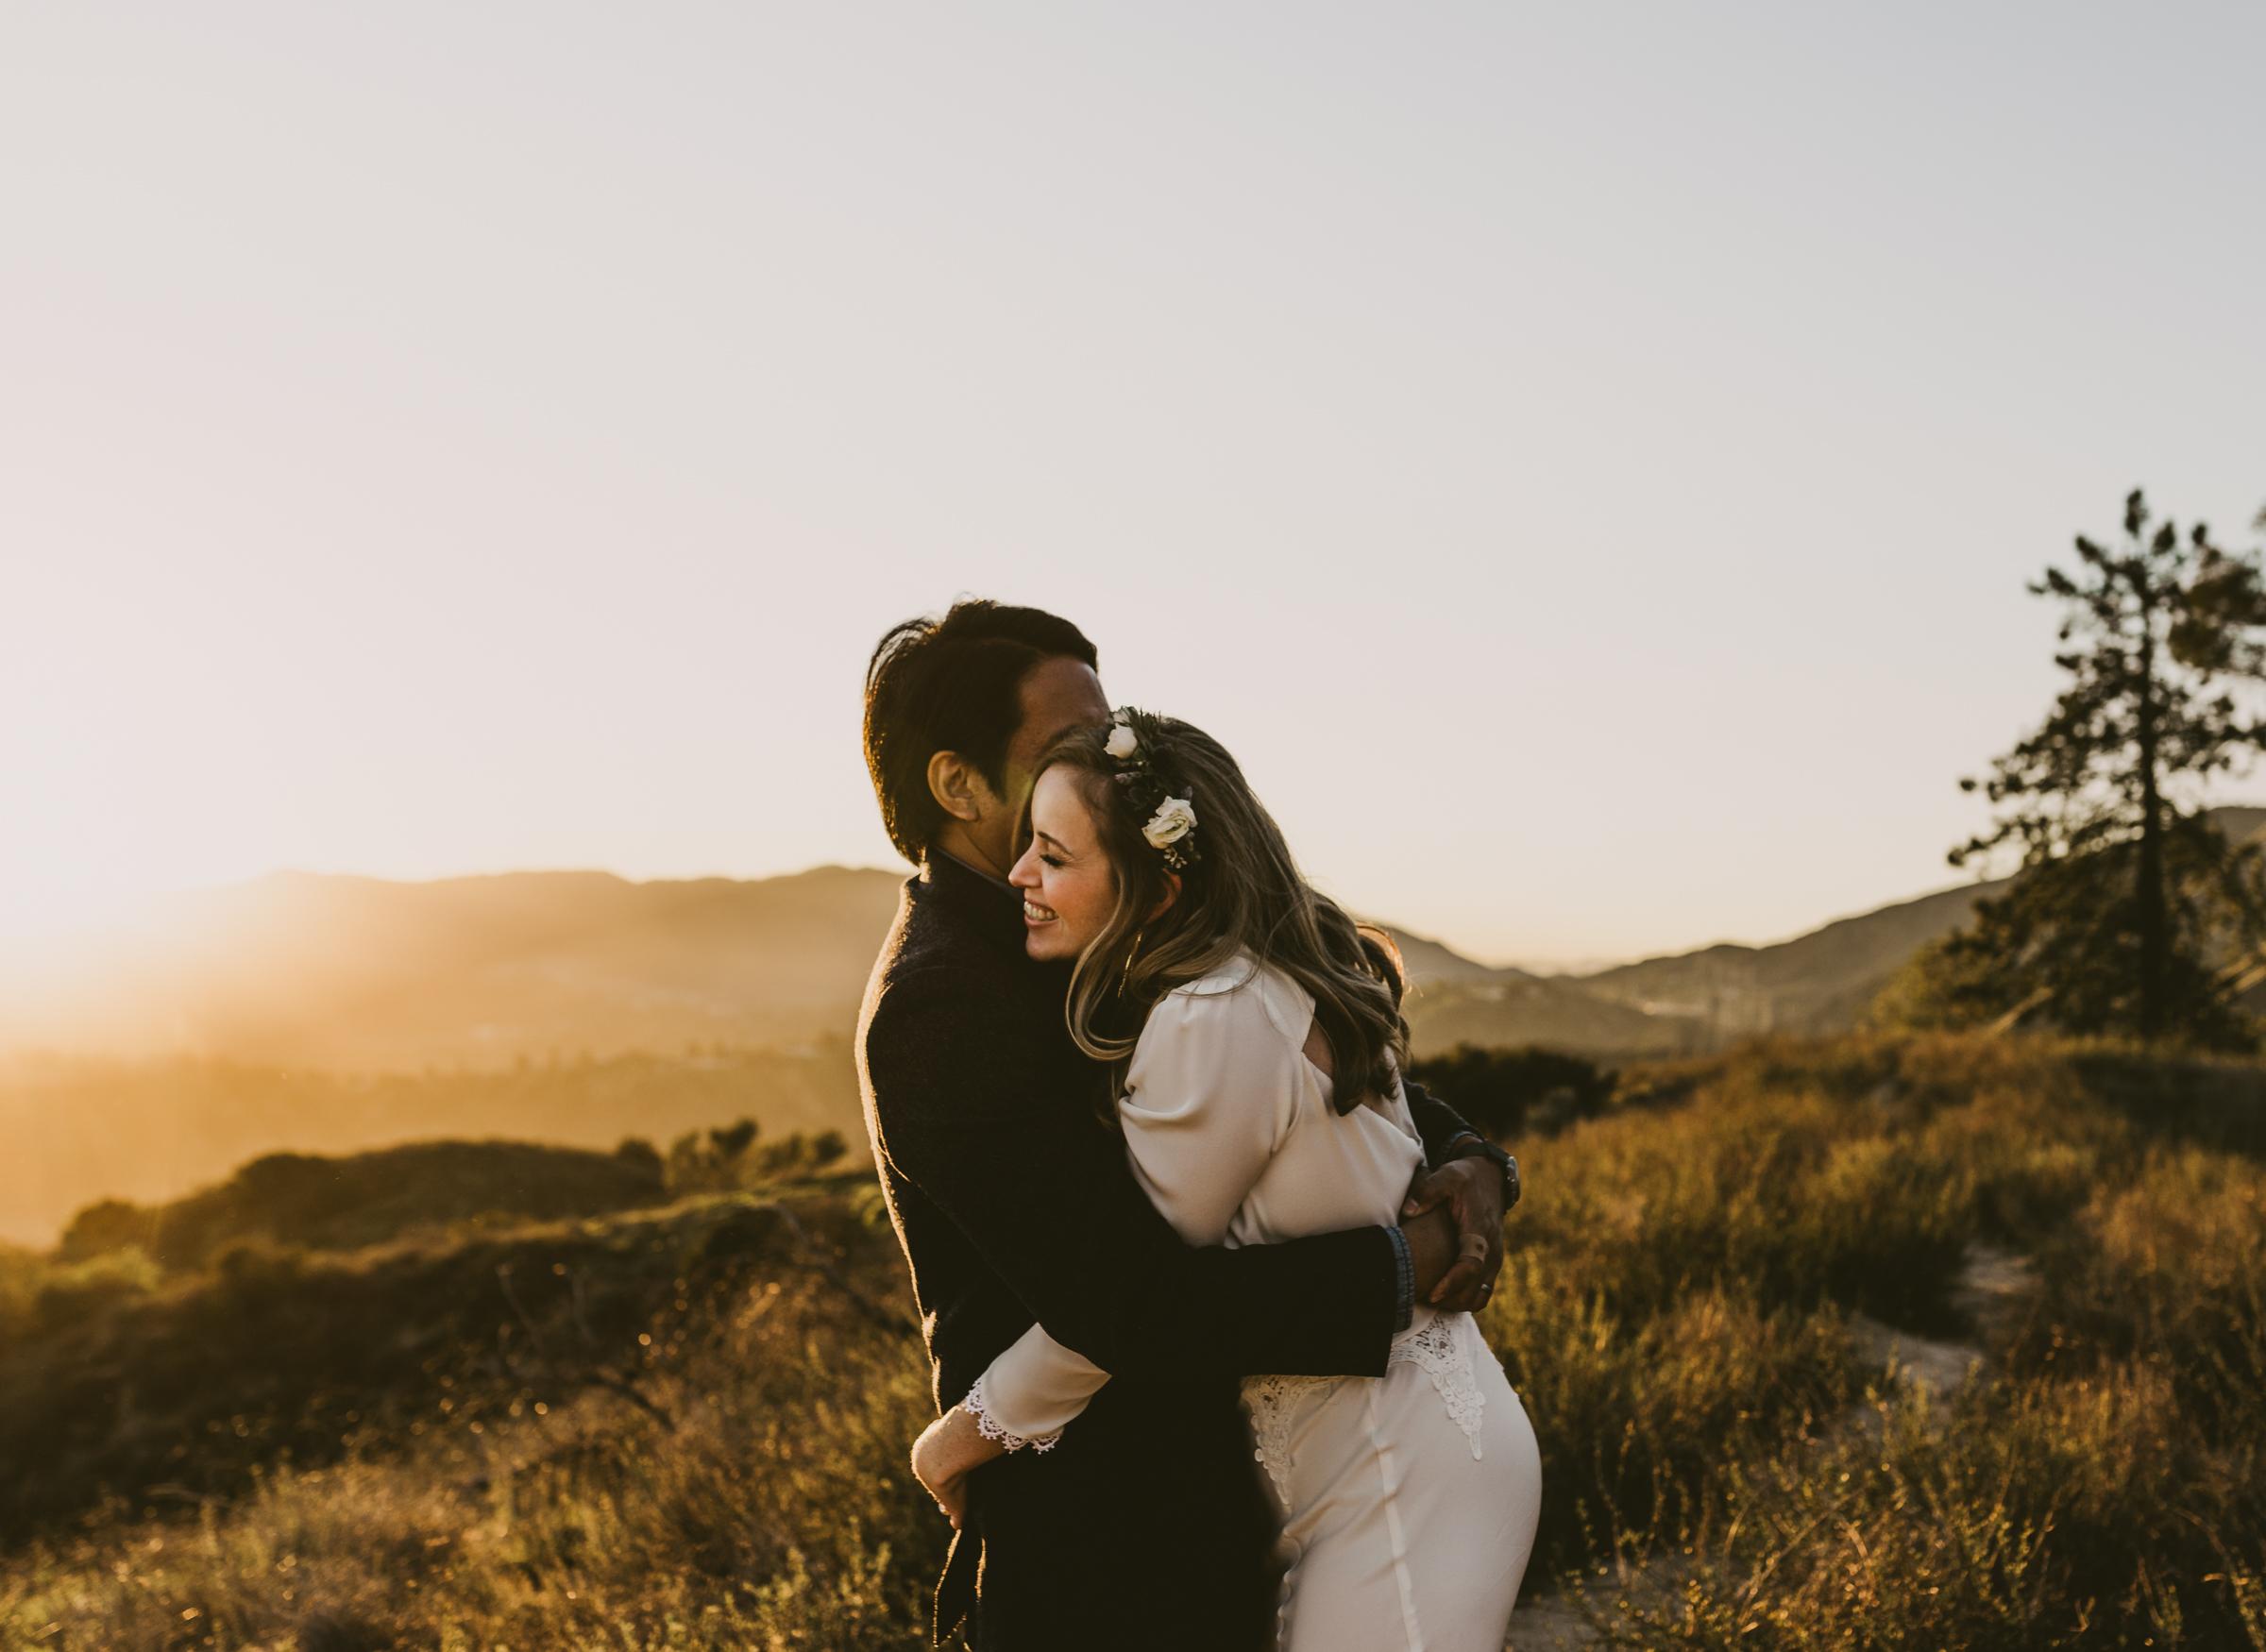 ©Isaiah + Taylor Photography - Intimate Elopement, Eaton Canyon, Los Angeles Wedding Photographer-82.jpg